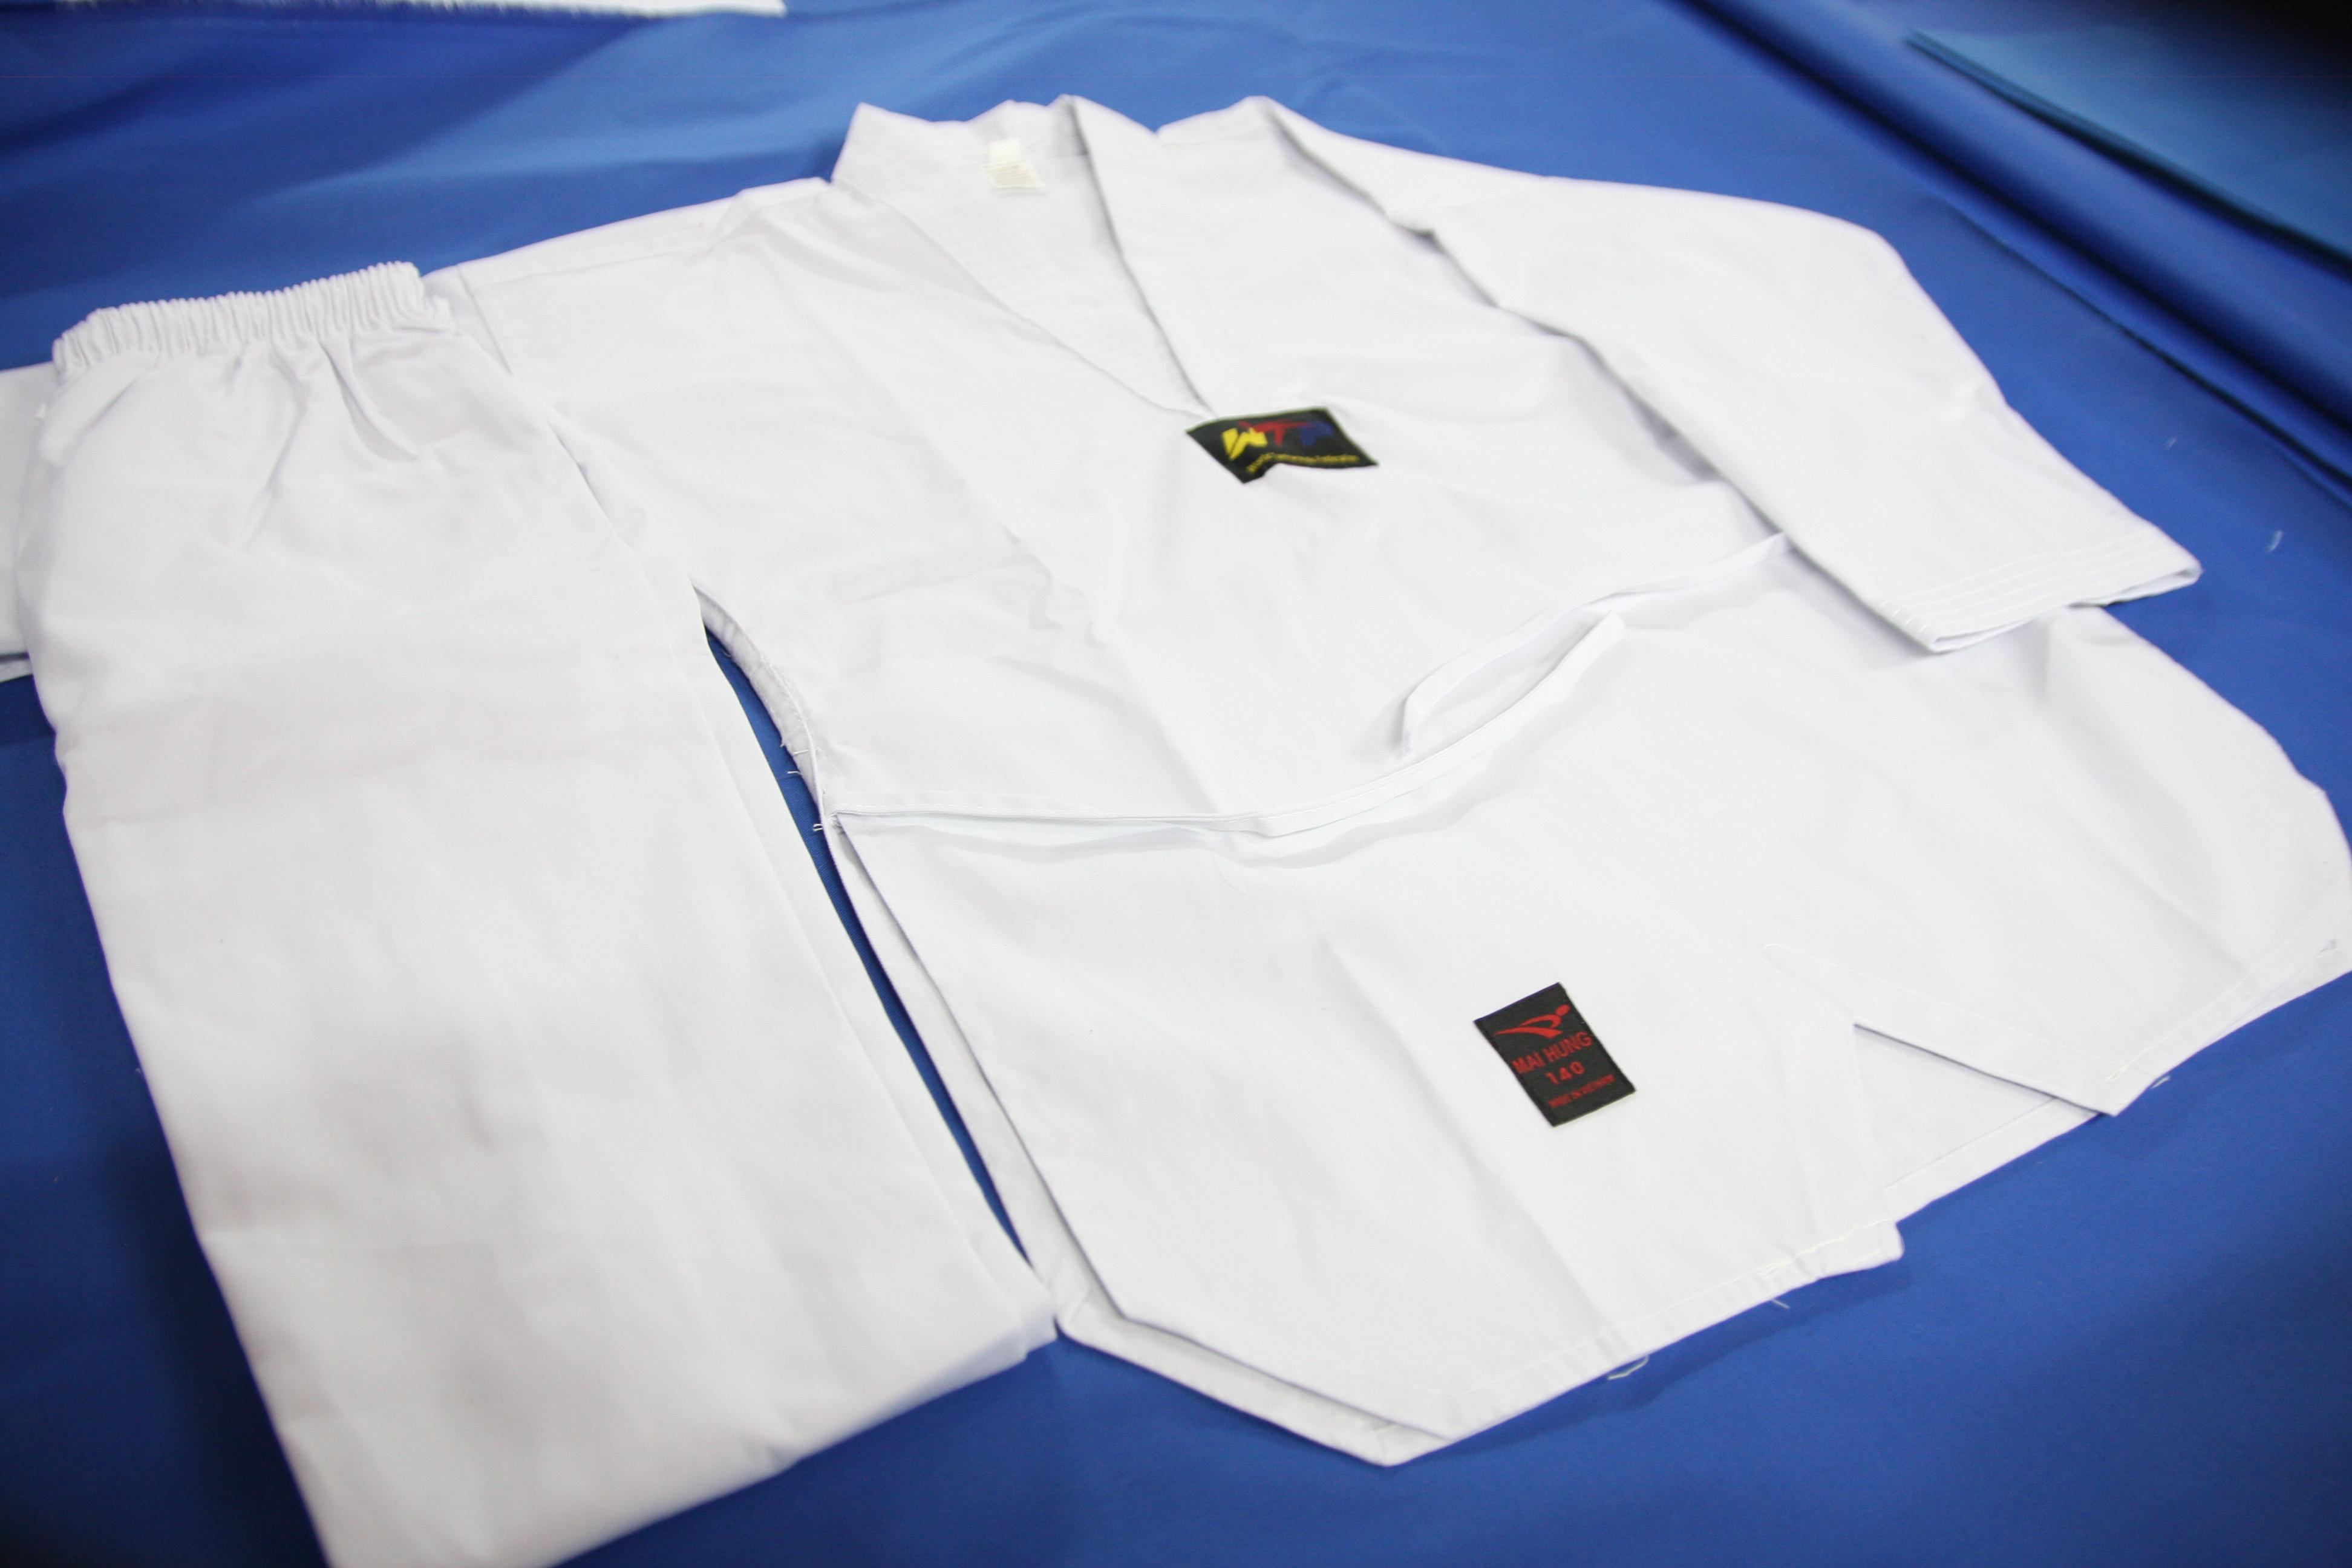 Võ phục Taekwondo Hiệu Mai Hùng